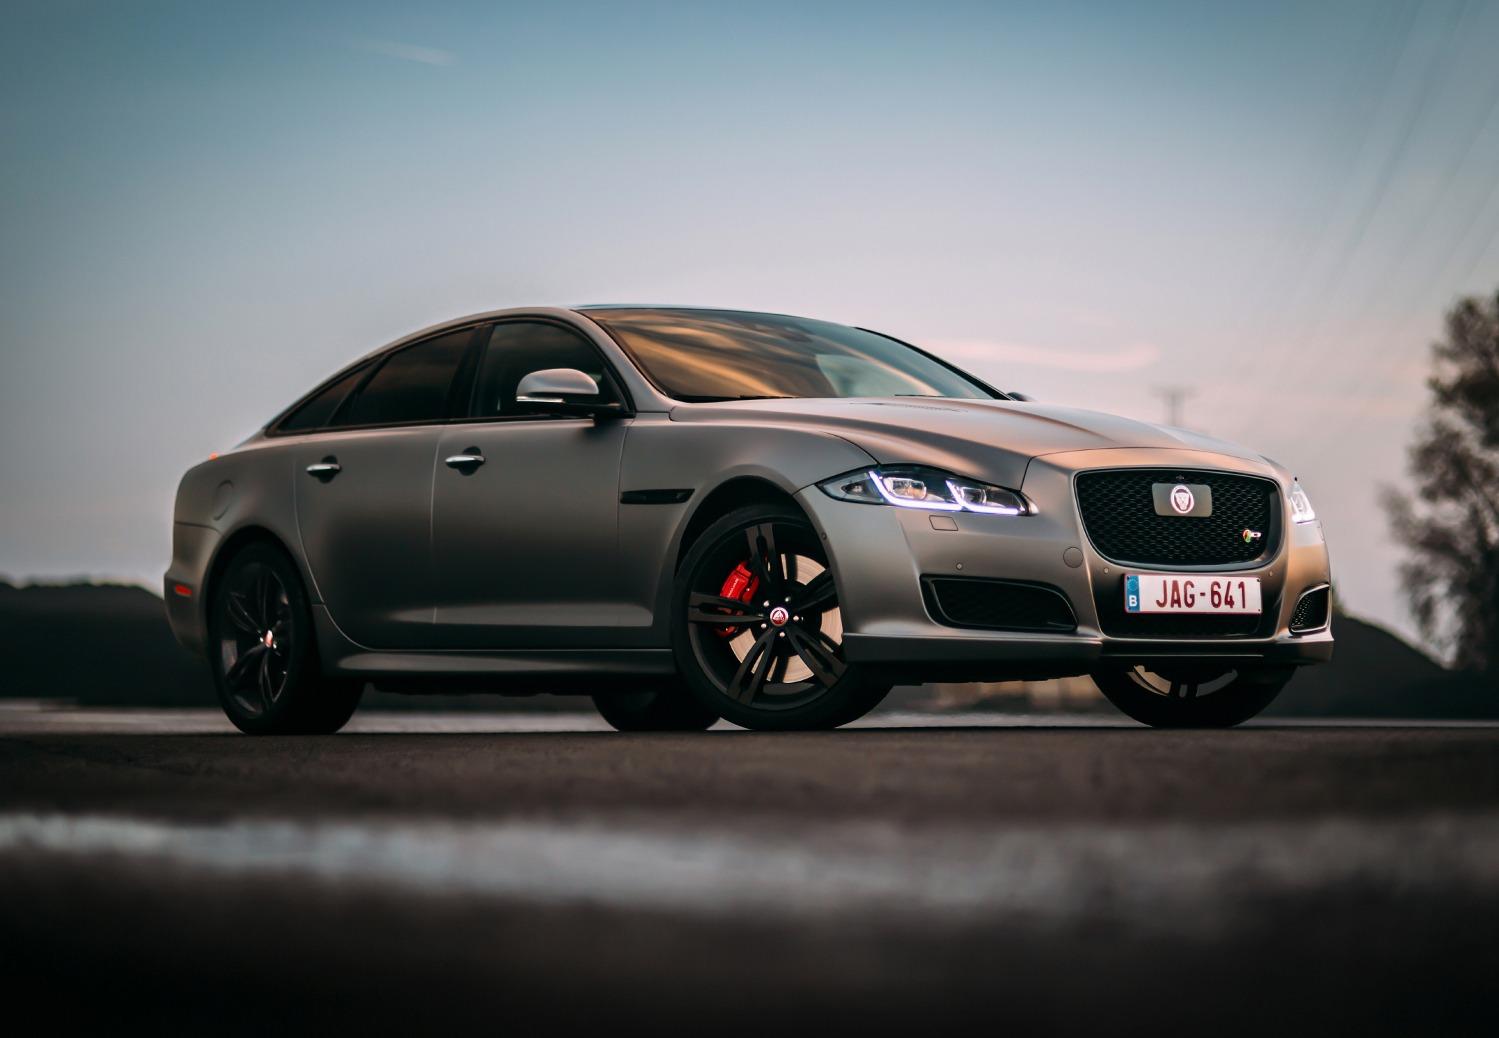 Rijtest: Jaguar XJR575